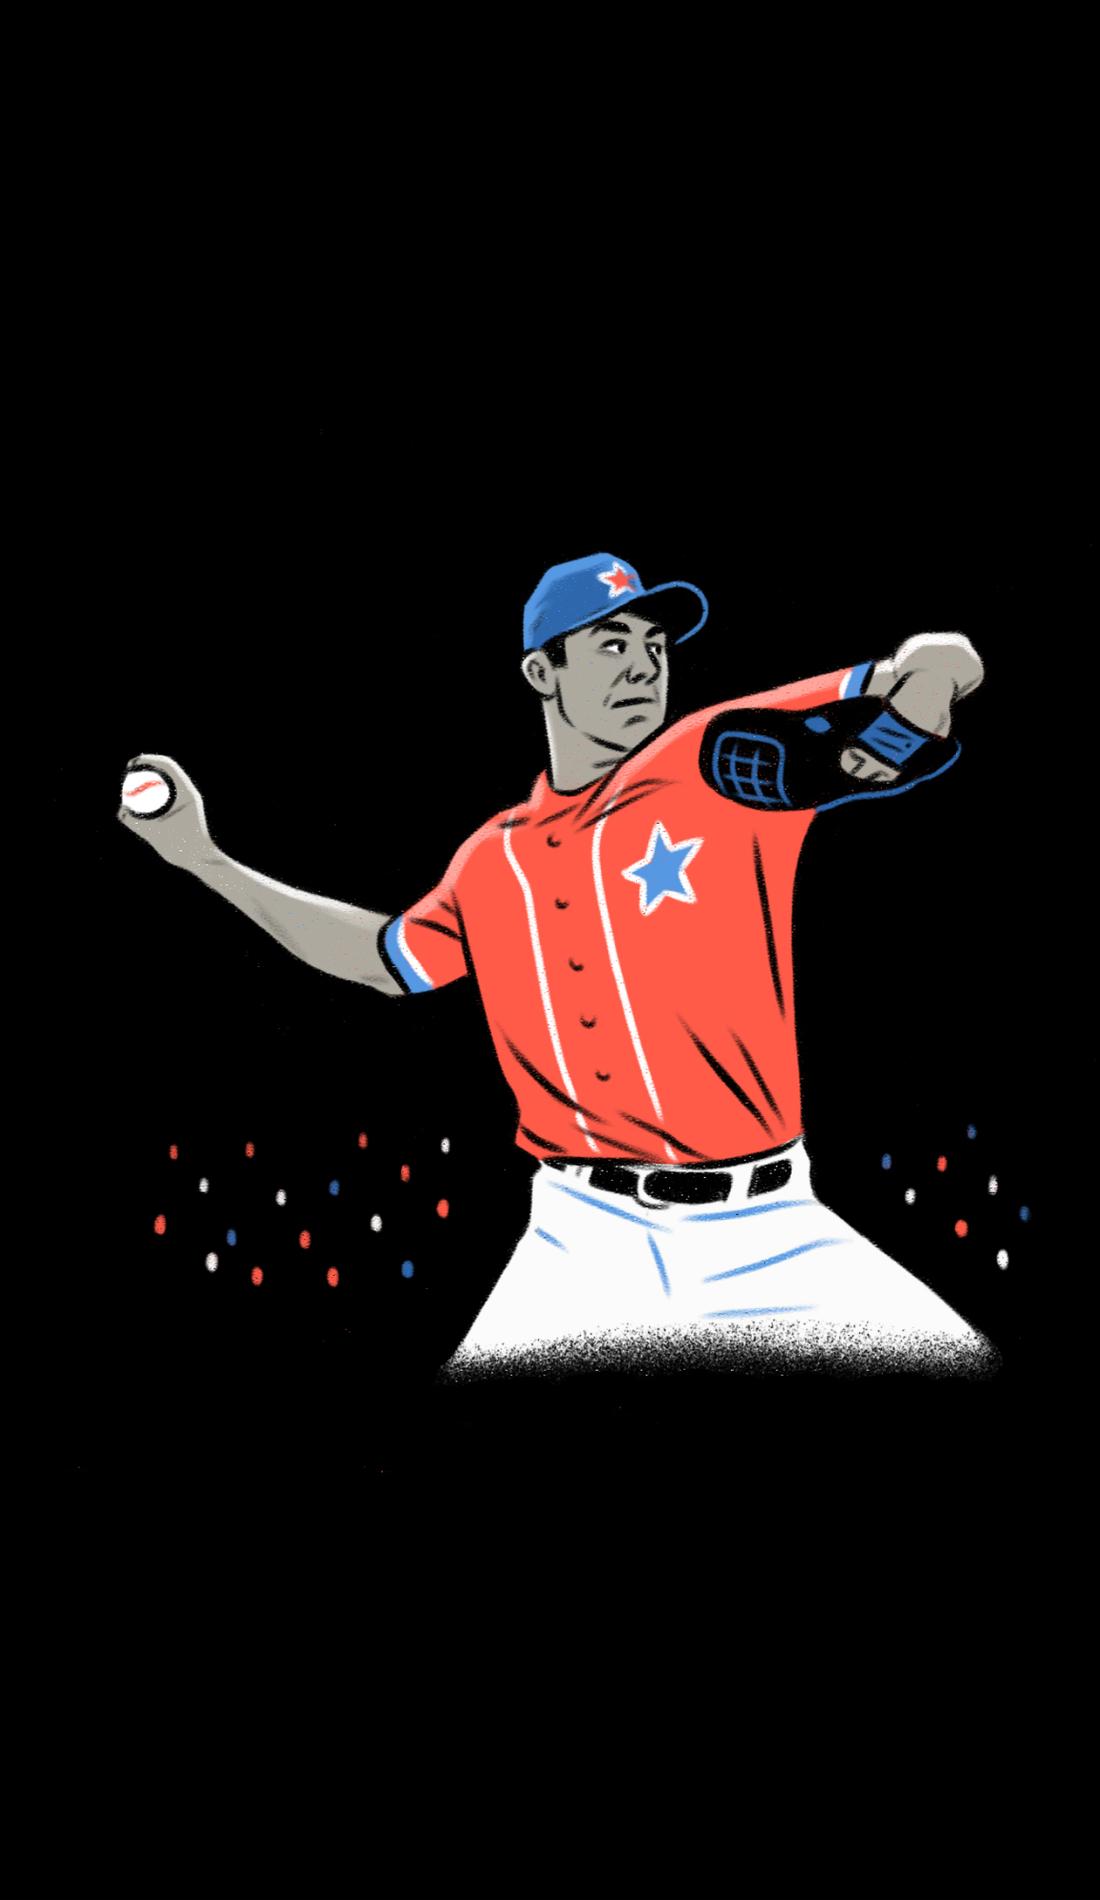 A Dayton Dragons live event